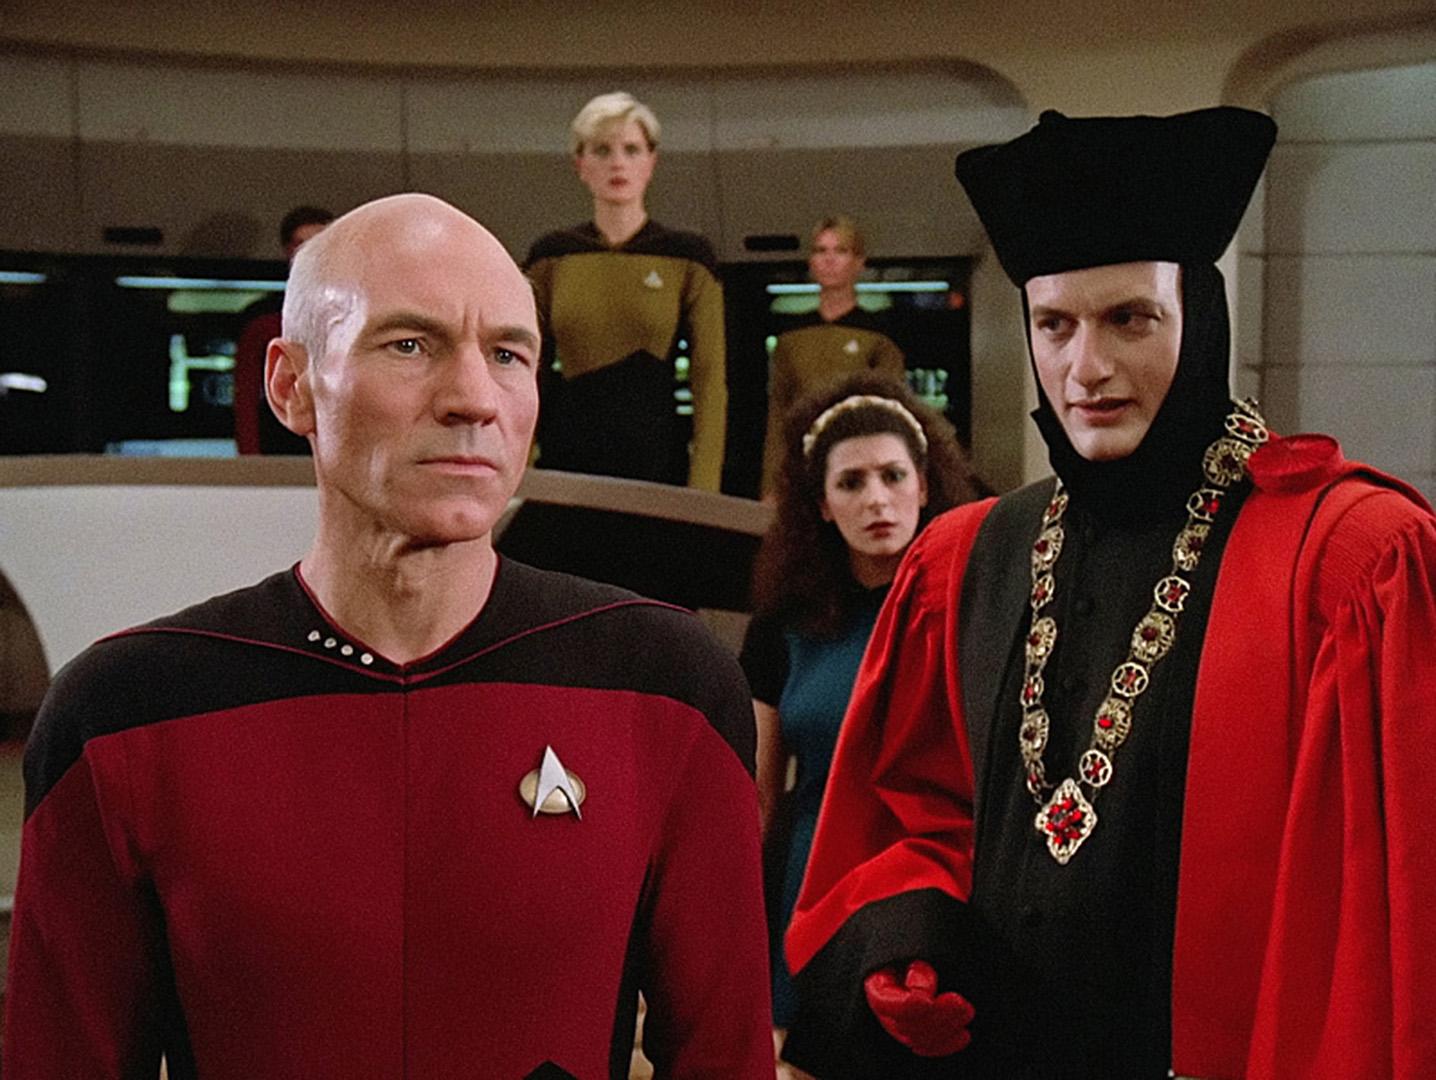 Encounter at Farpoint  (Star Trek: The Next Generation, Season 1, Episode 1)